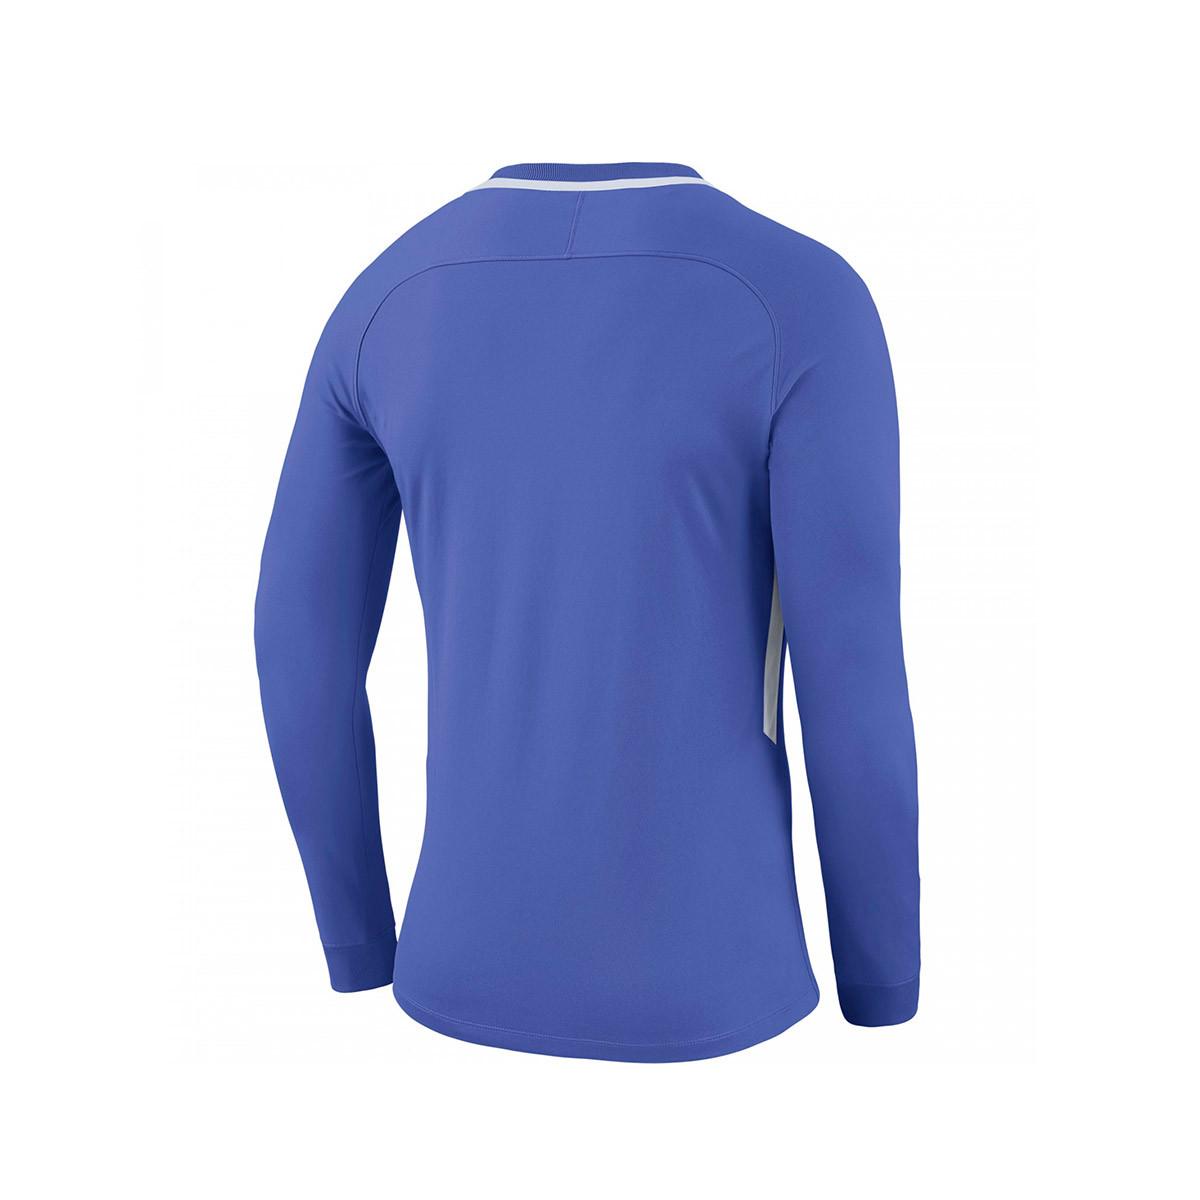 b7978b516 Jersey Nike Park Goalie III m l Persian violet - Football store Fútbol  Emotion